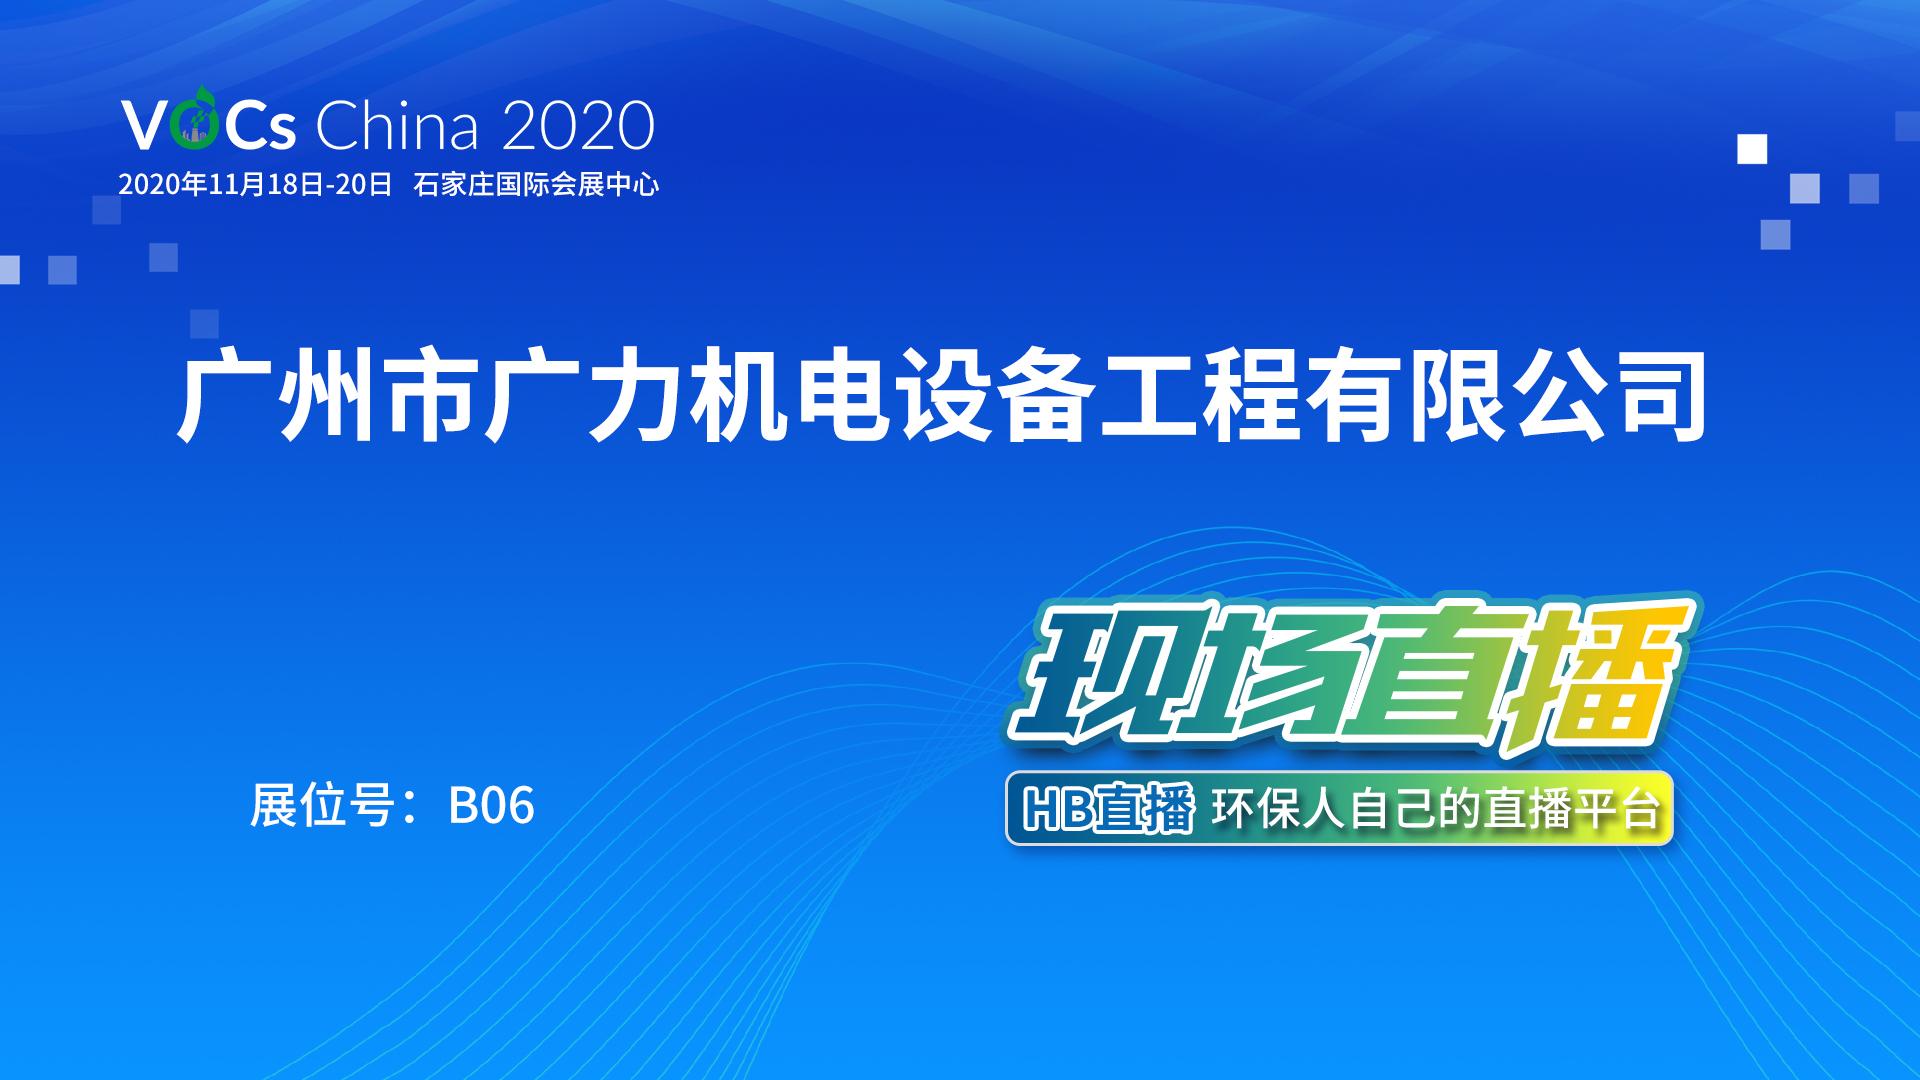 VOCs 2020逛展:广州广力机电直播推荐VOCS低温催化燃烧设备